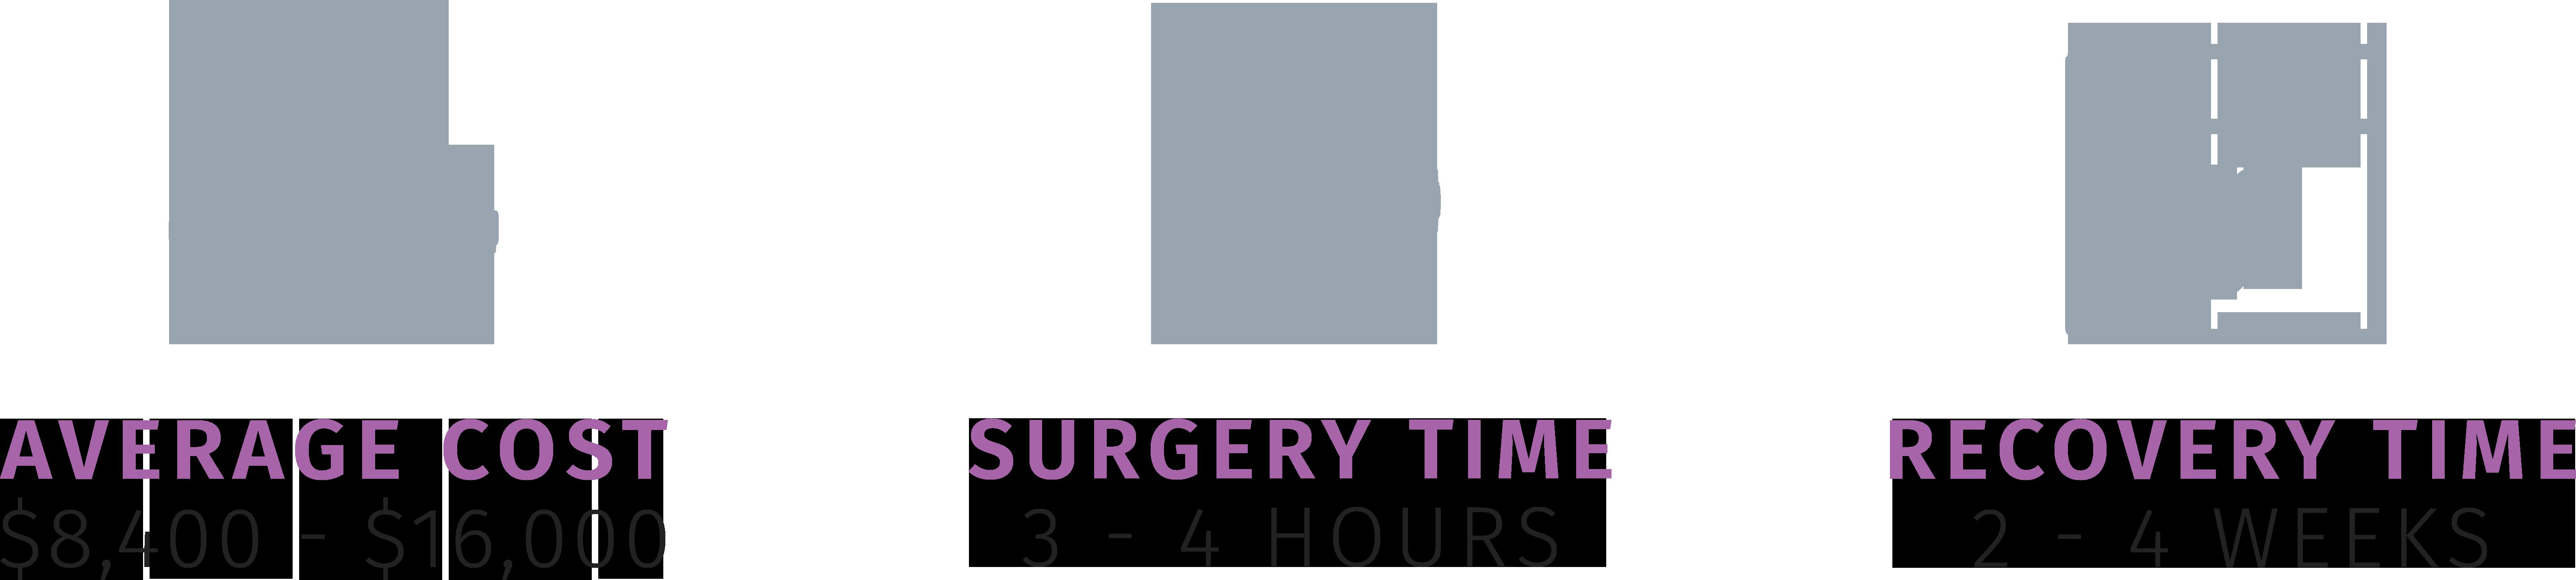 Surgery Specs (BBL)